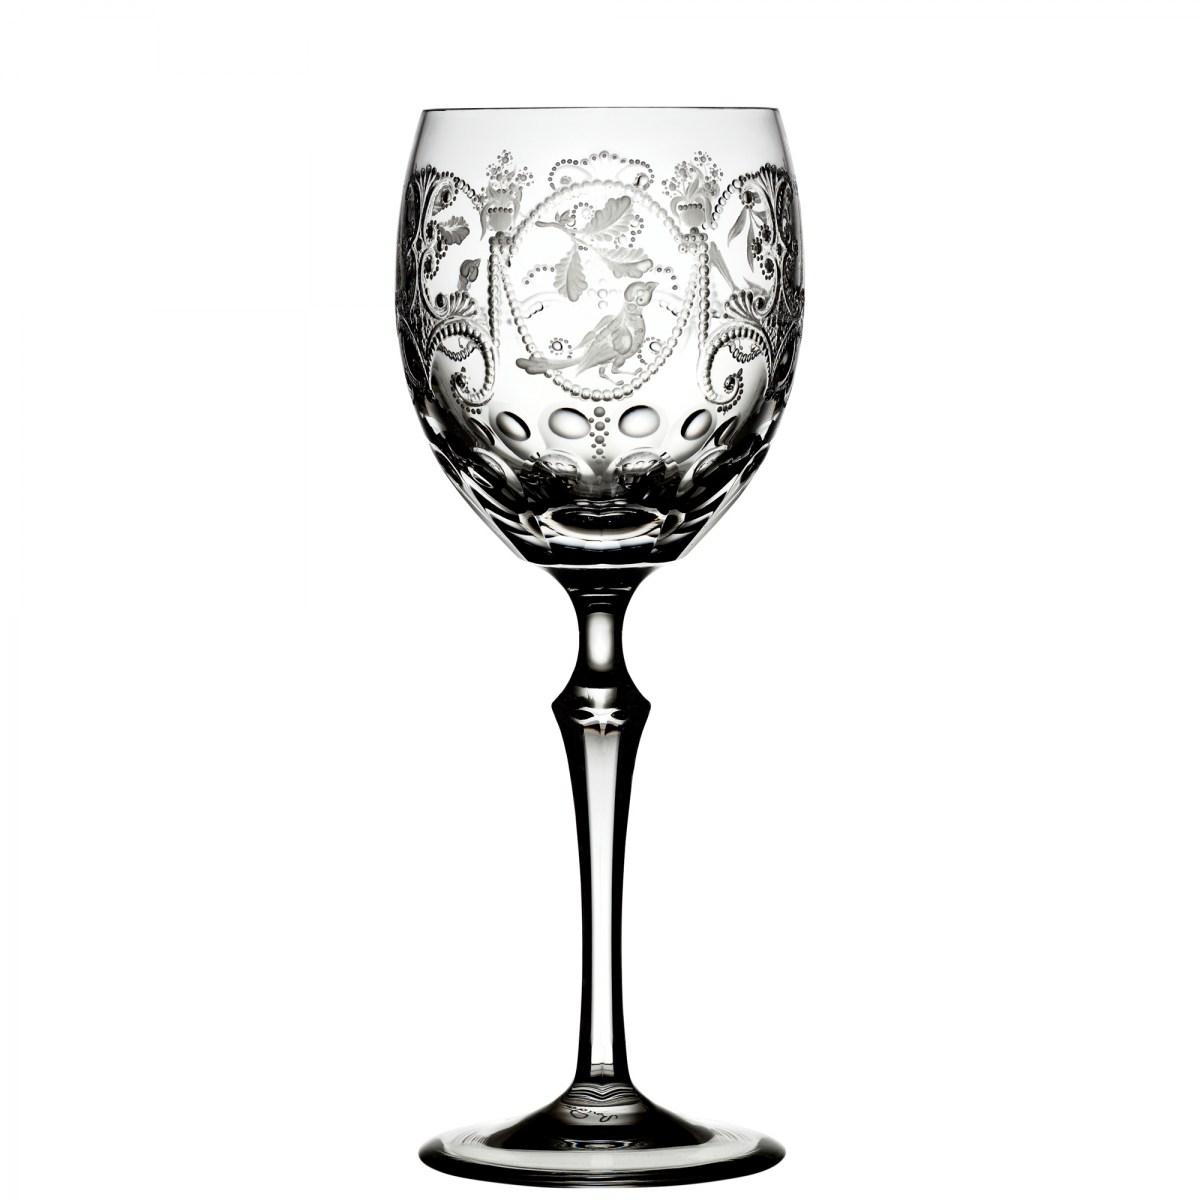 Madeira Clear Wine - $ 257 / € 225